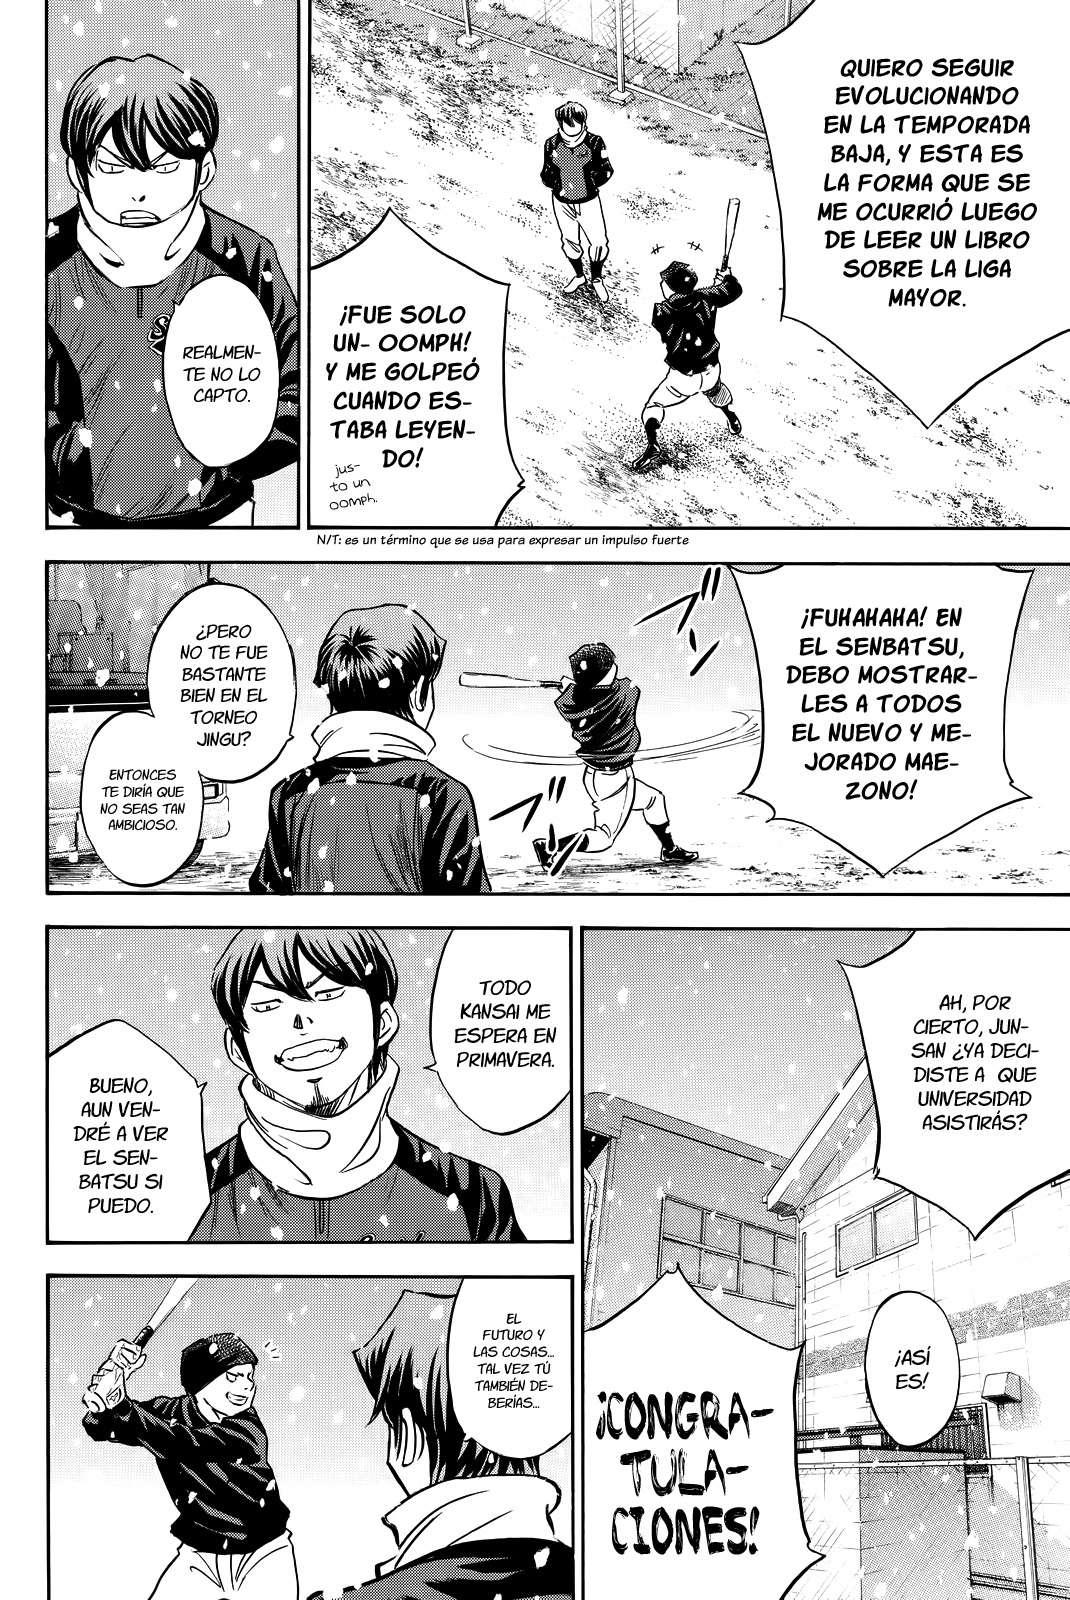 http://c5.ninemanga.com/es_manga/24/1752/422720/e13dd027be0f2152ce387ac0ea83d863.jpg Page 23